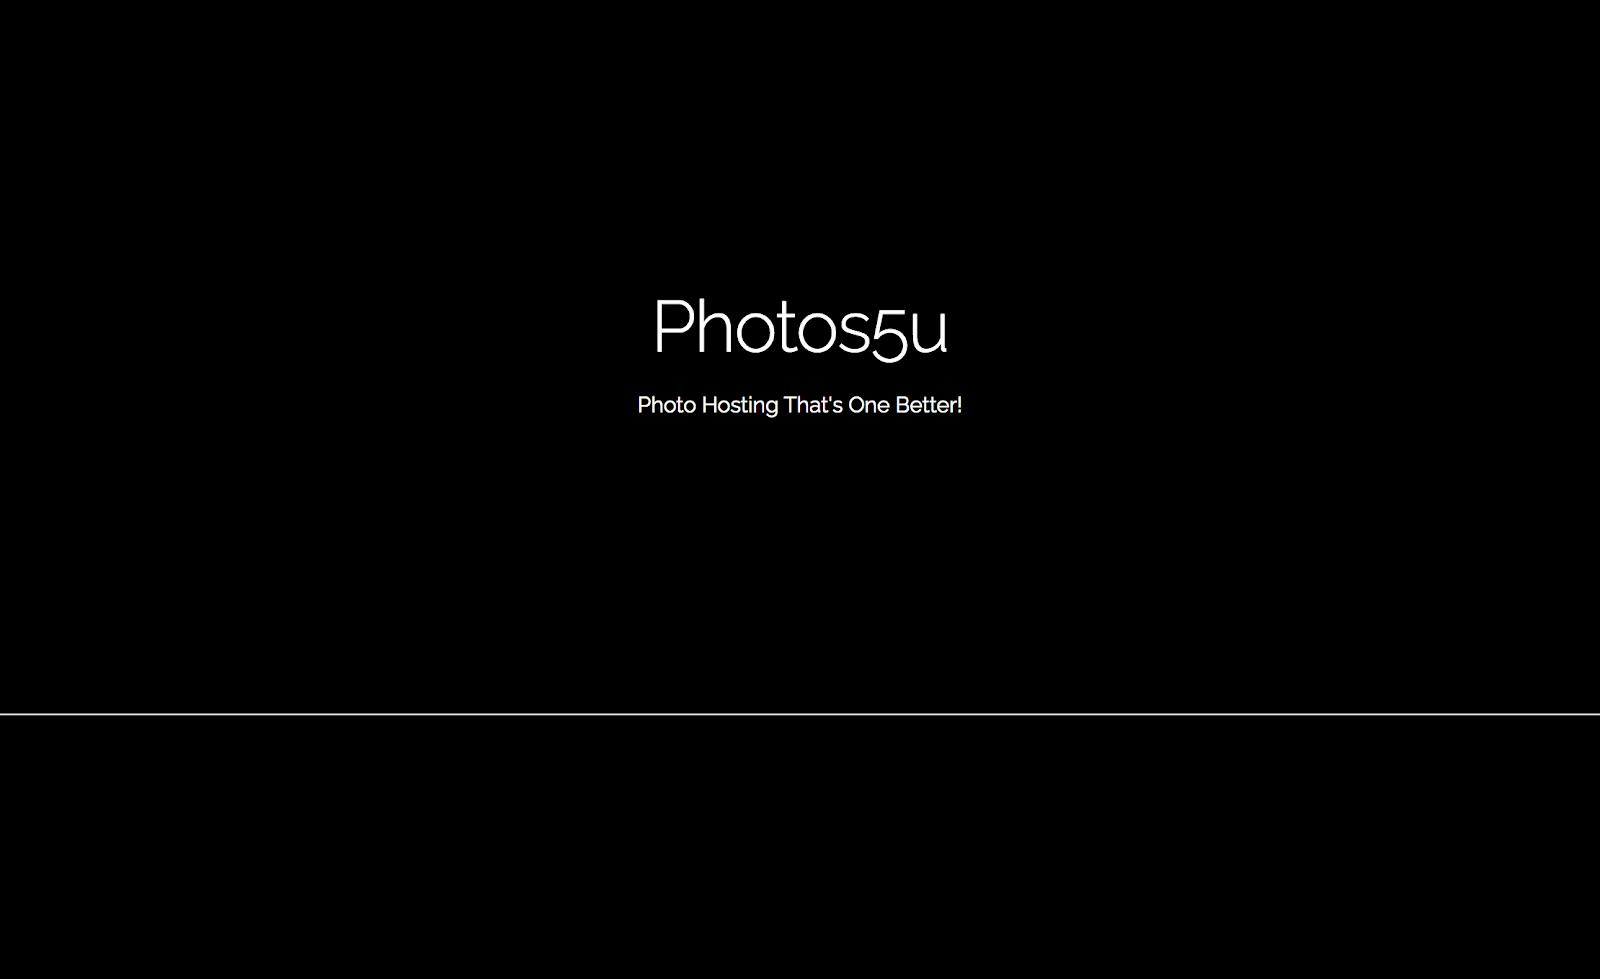 Photos5u website screenshot.